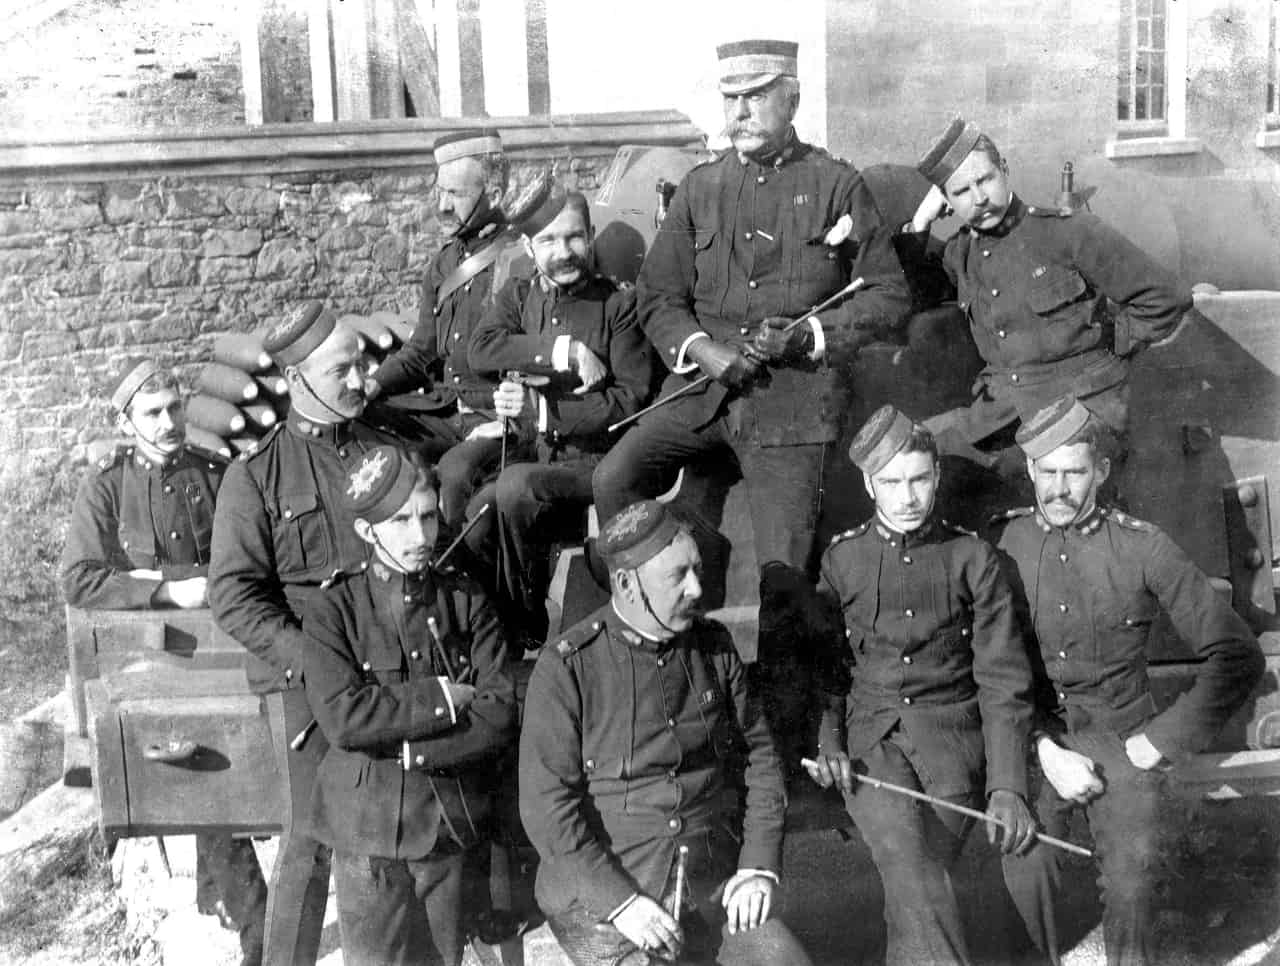 Officers-RCA-Citadel-_-Quebec-cica-1890_s-Shilo-Stag